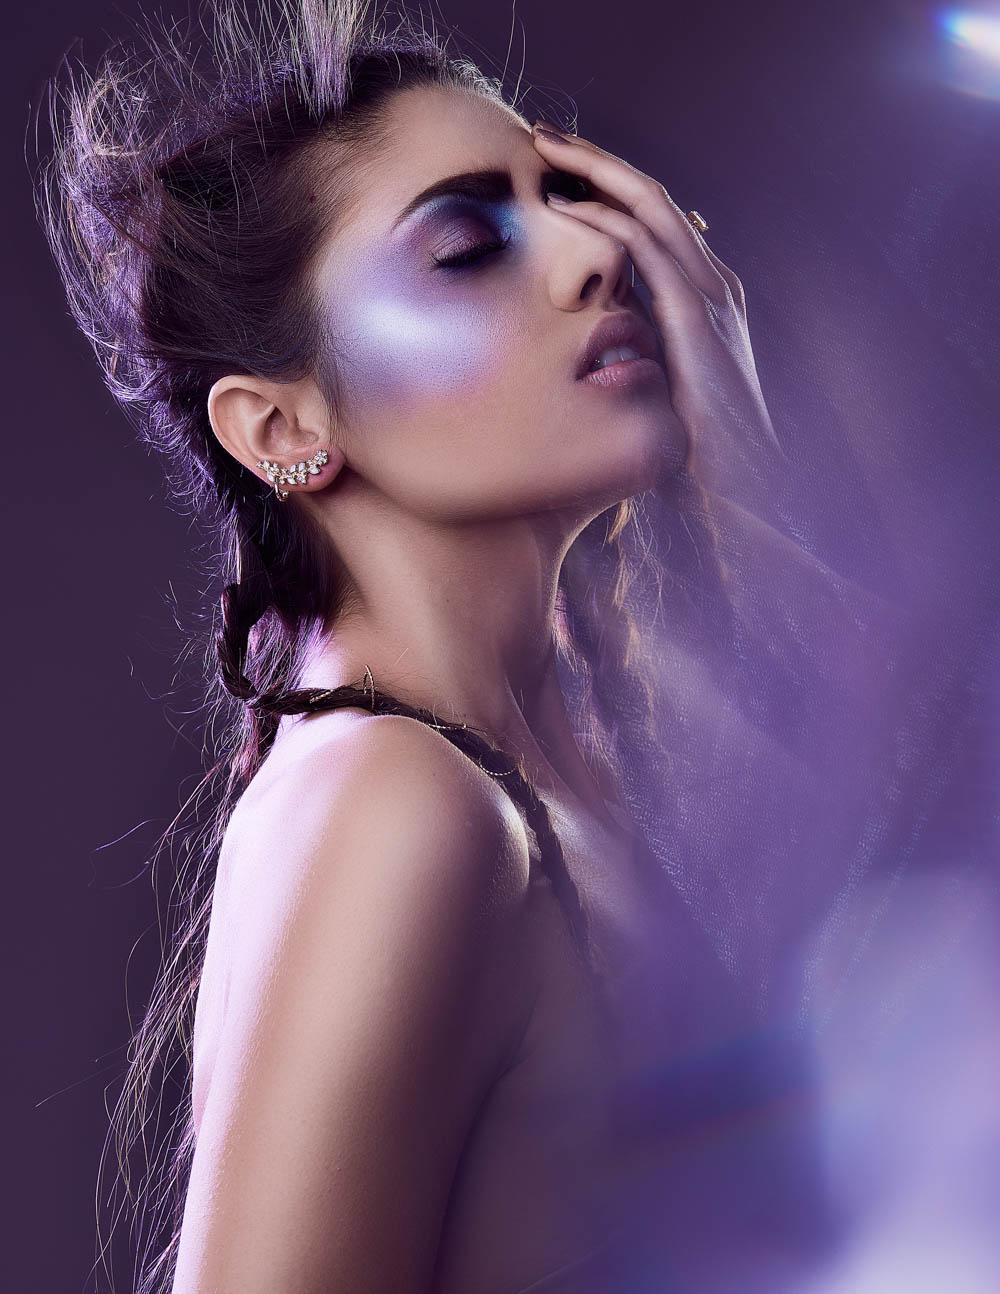 editorial-simone-haas-bianca-puchmueller-models-makeup-metallized-makeup-portrait-lizz-sator-prontolux04_spectrum_byLizzKrobath.jpg